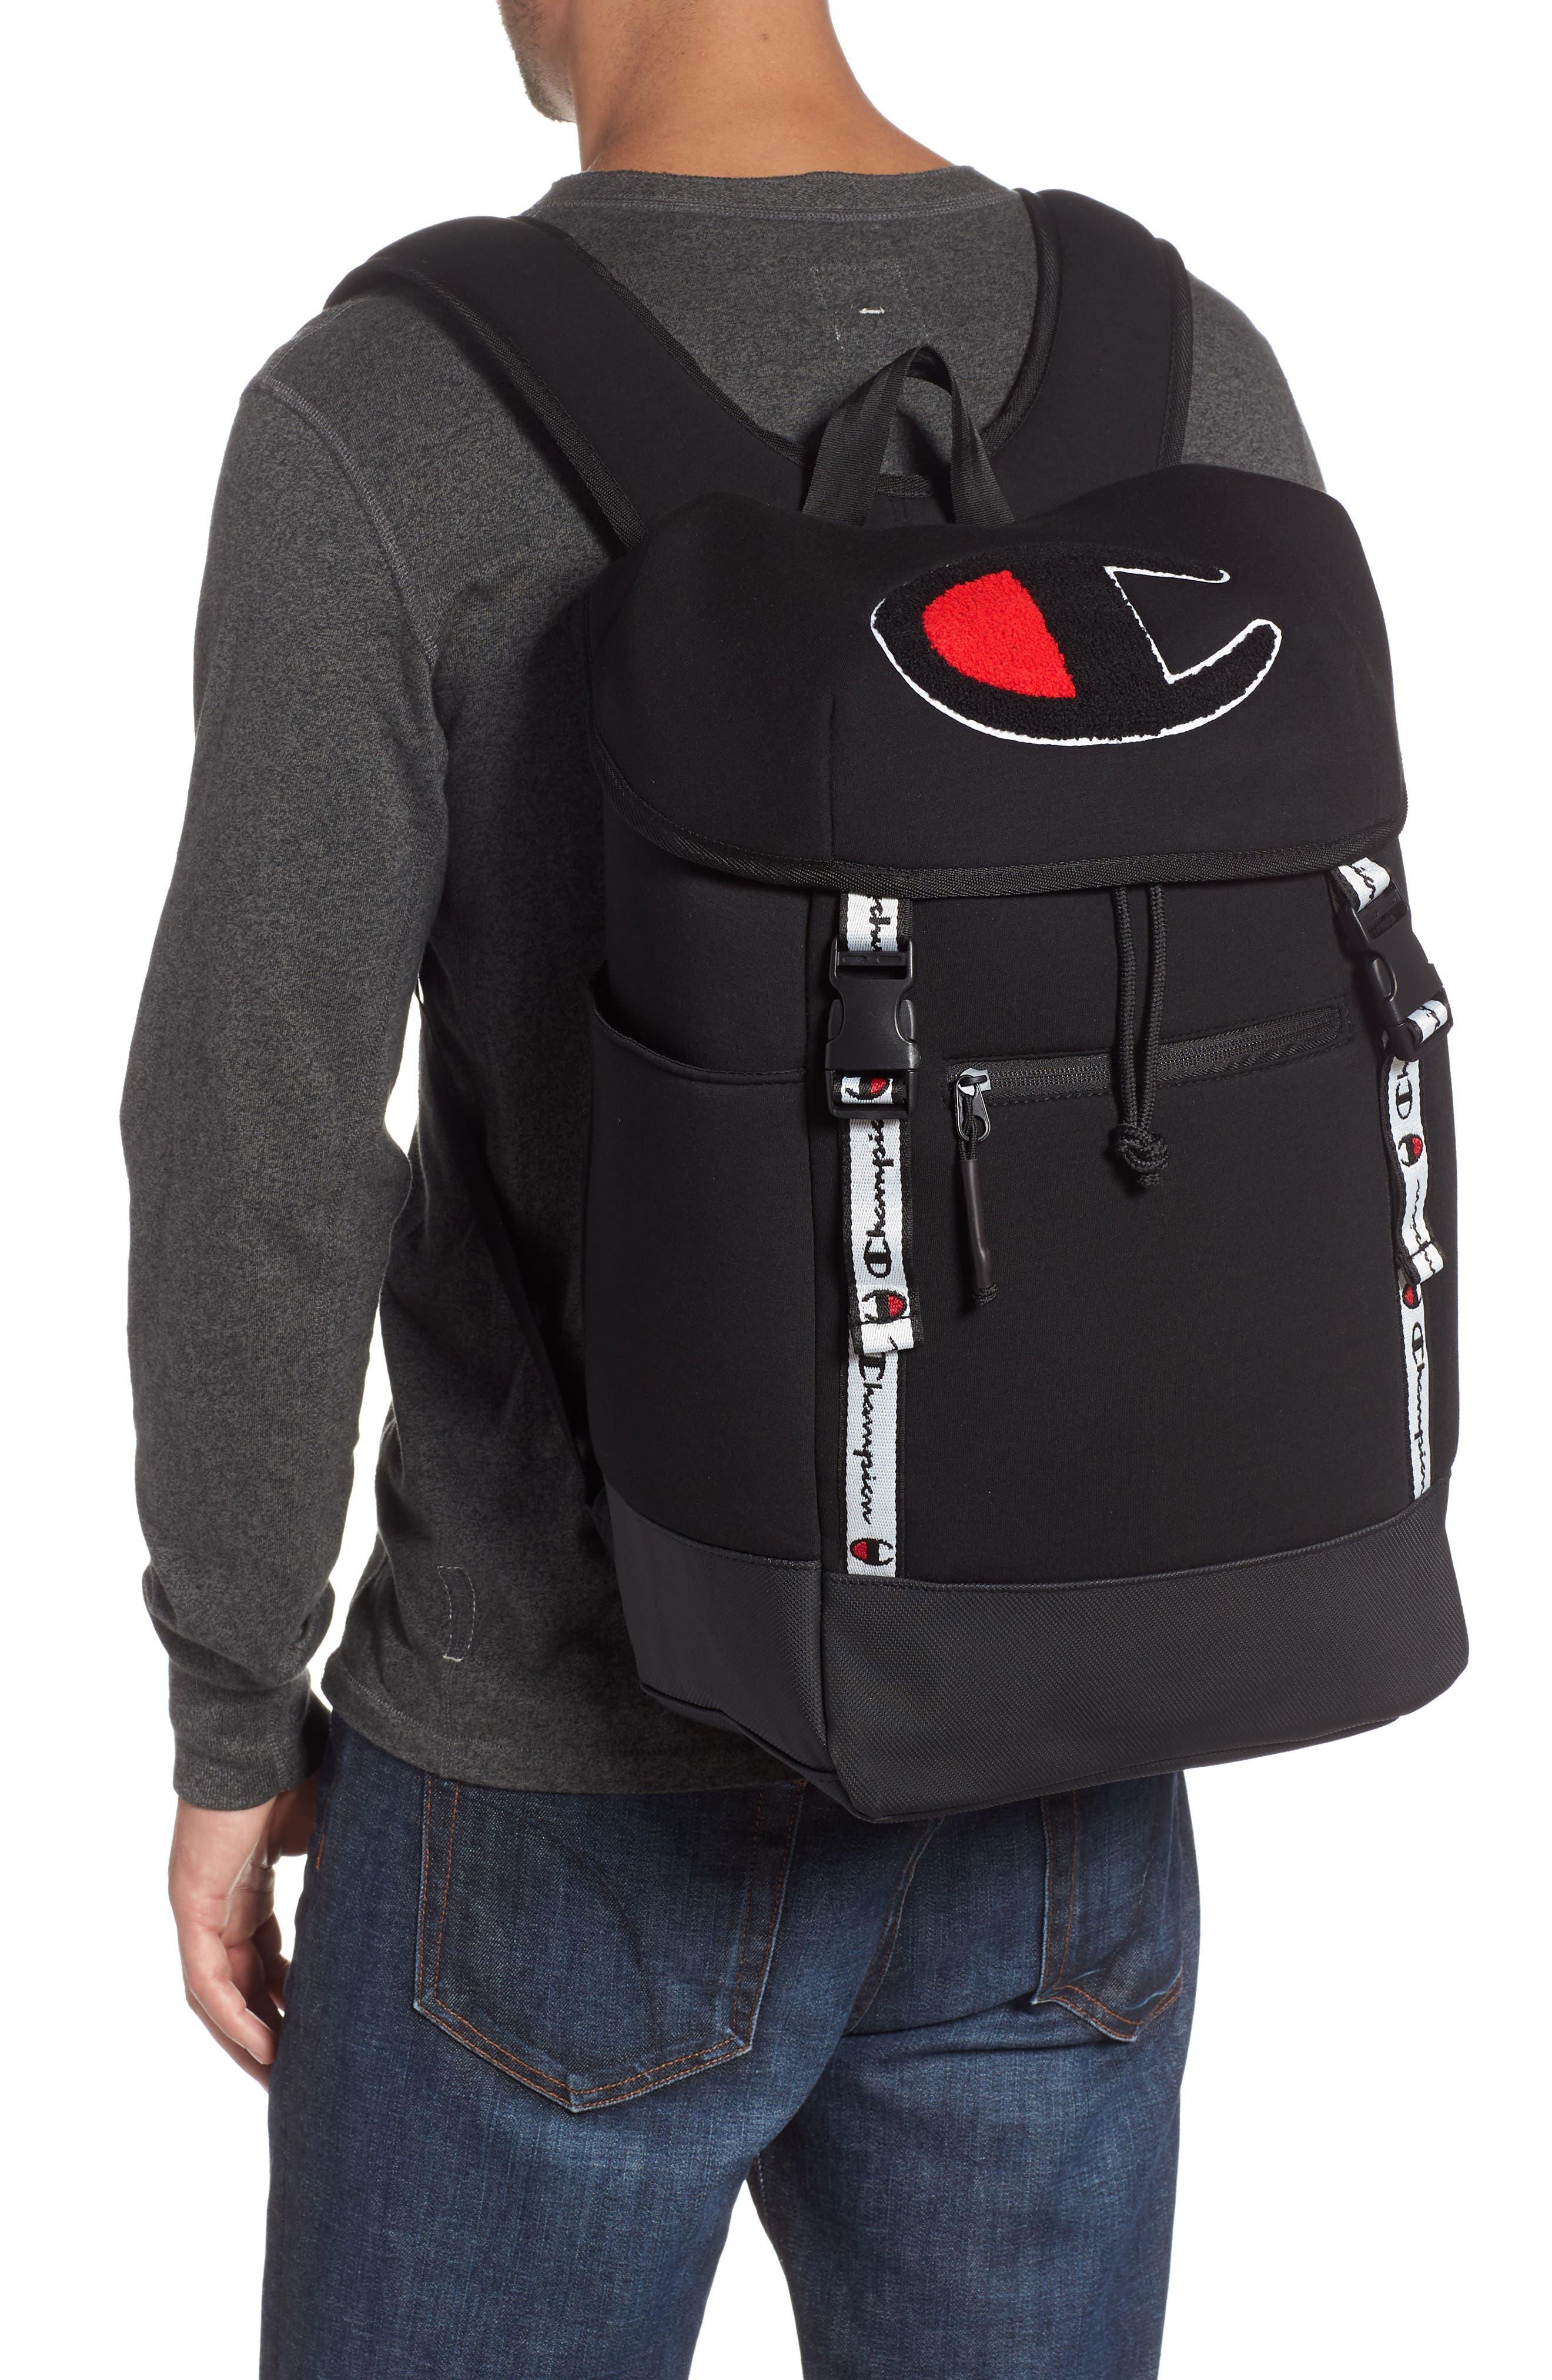 Top Load Backpack,                             Alternate thumbnail 2, color,                             BLACK